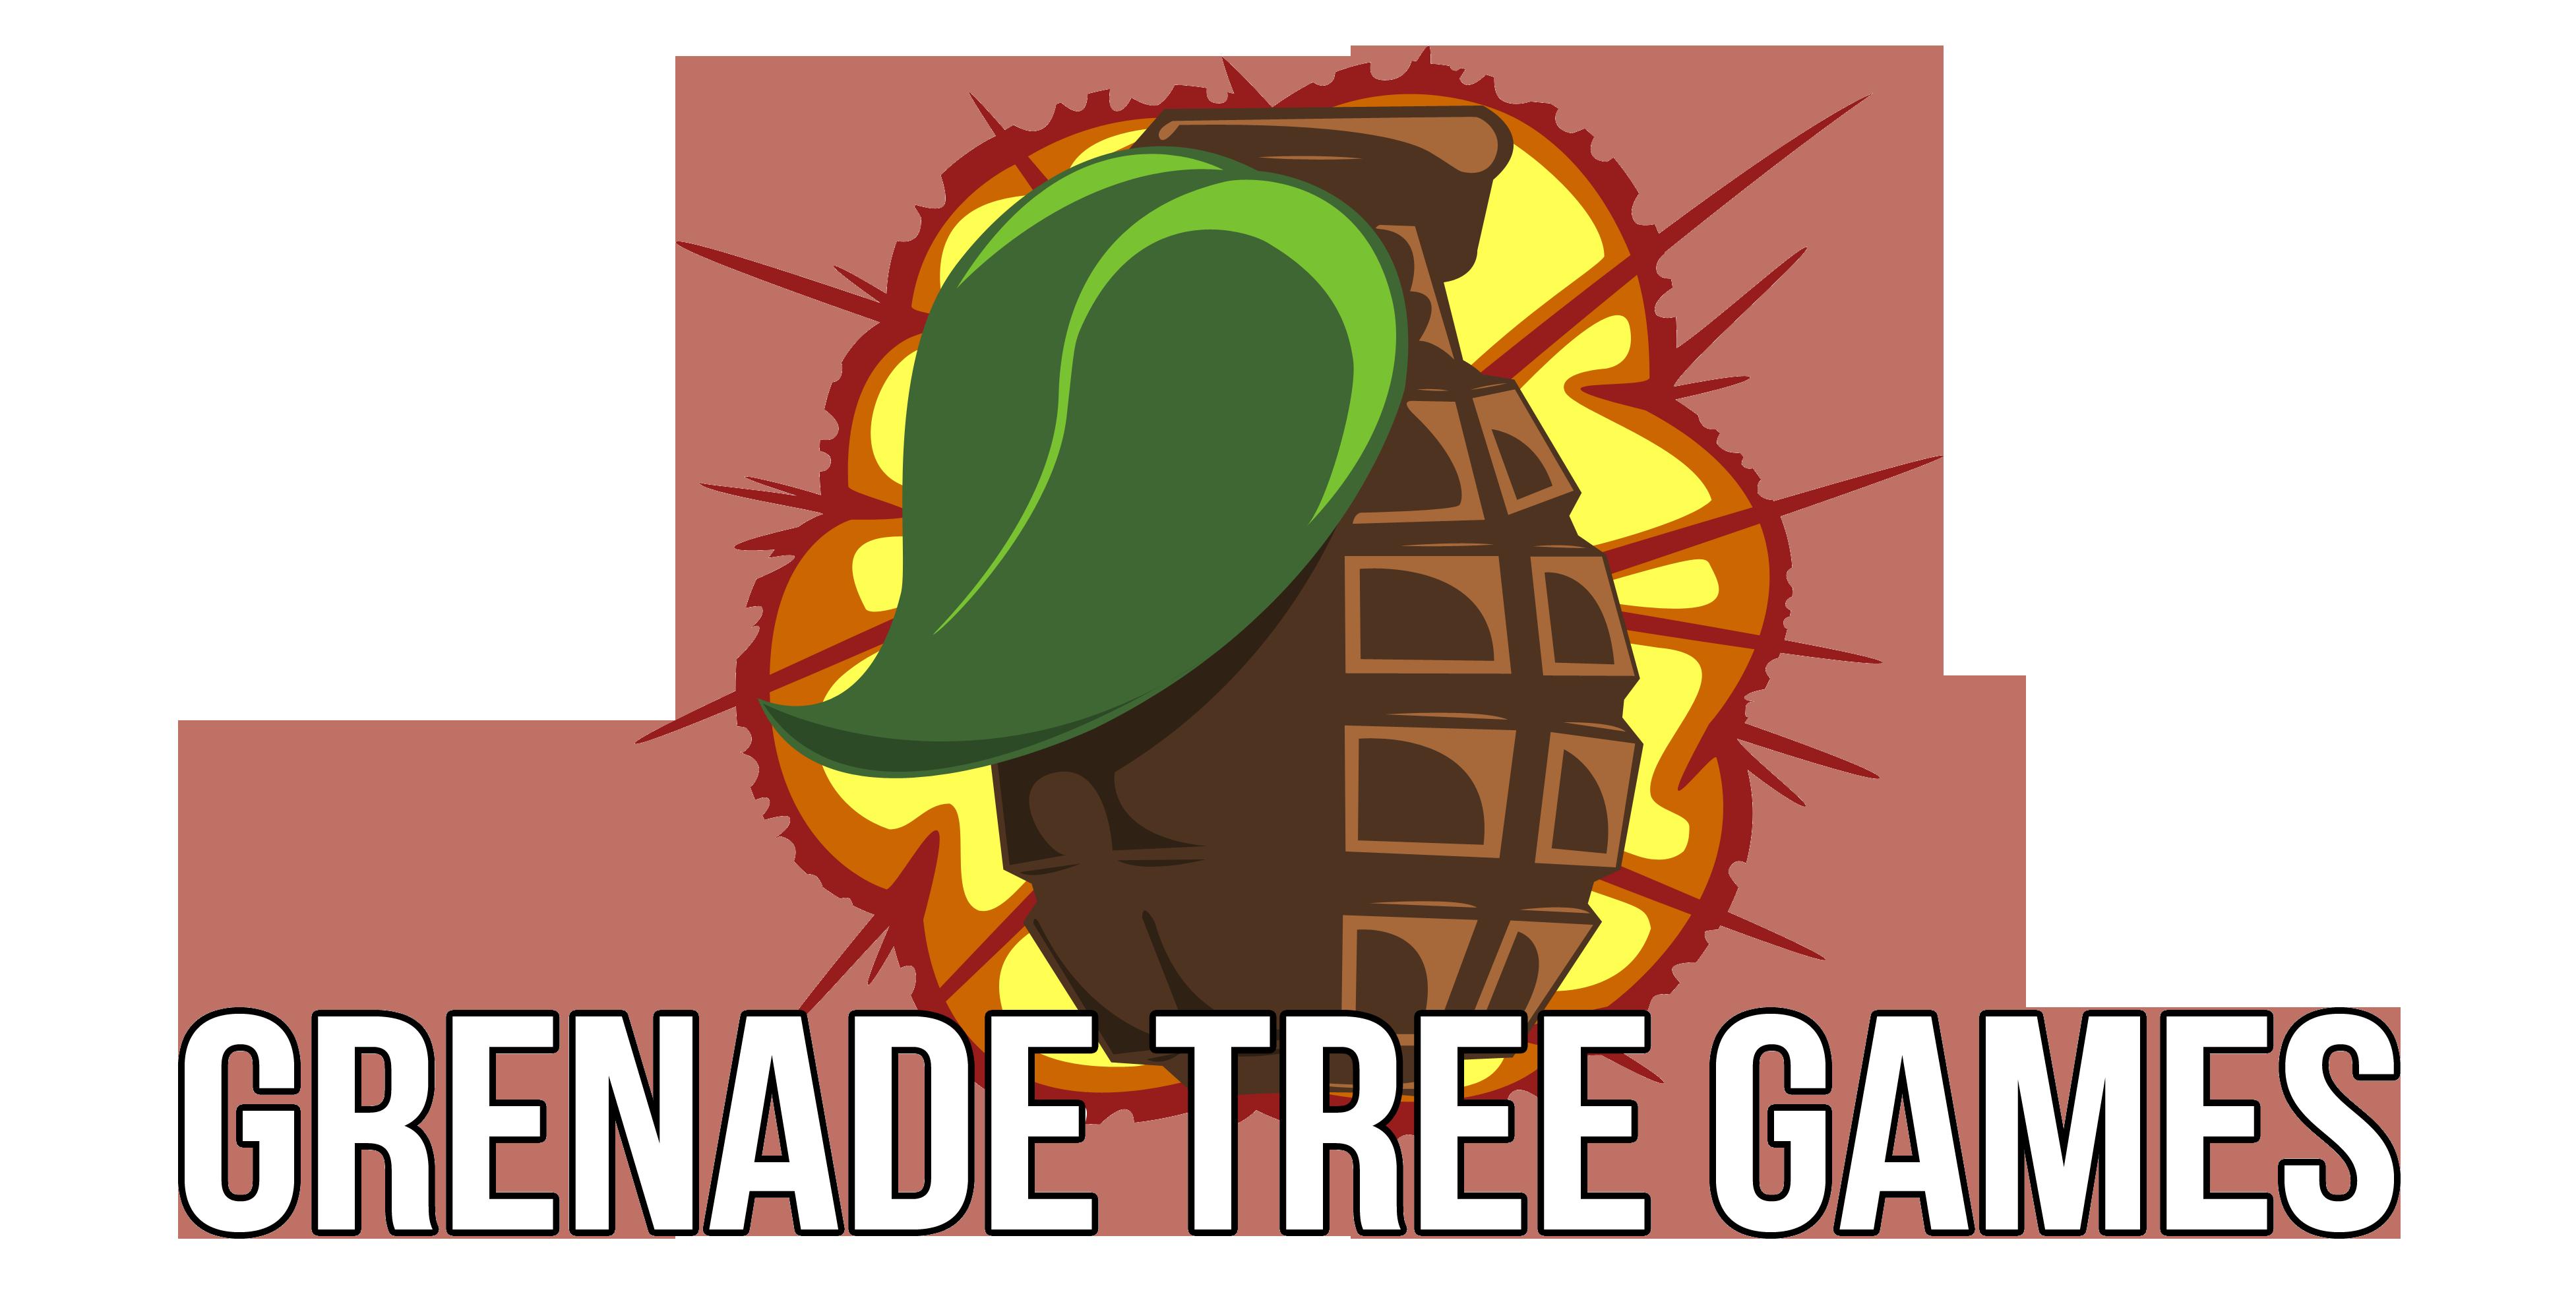 Grenade Tree Games